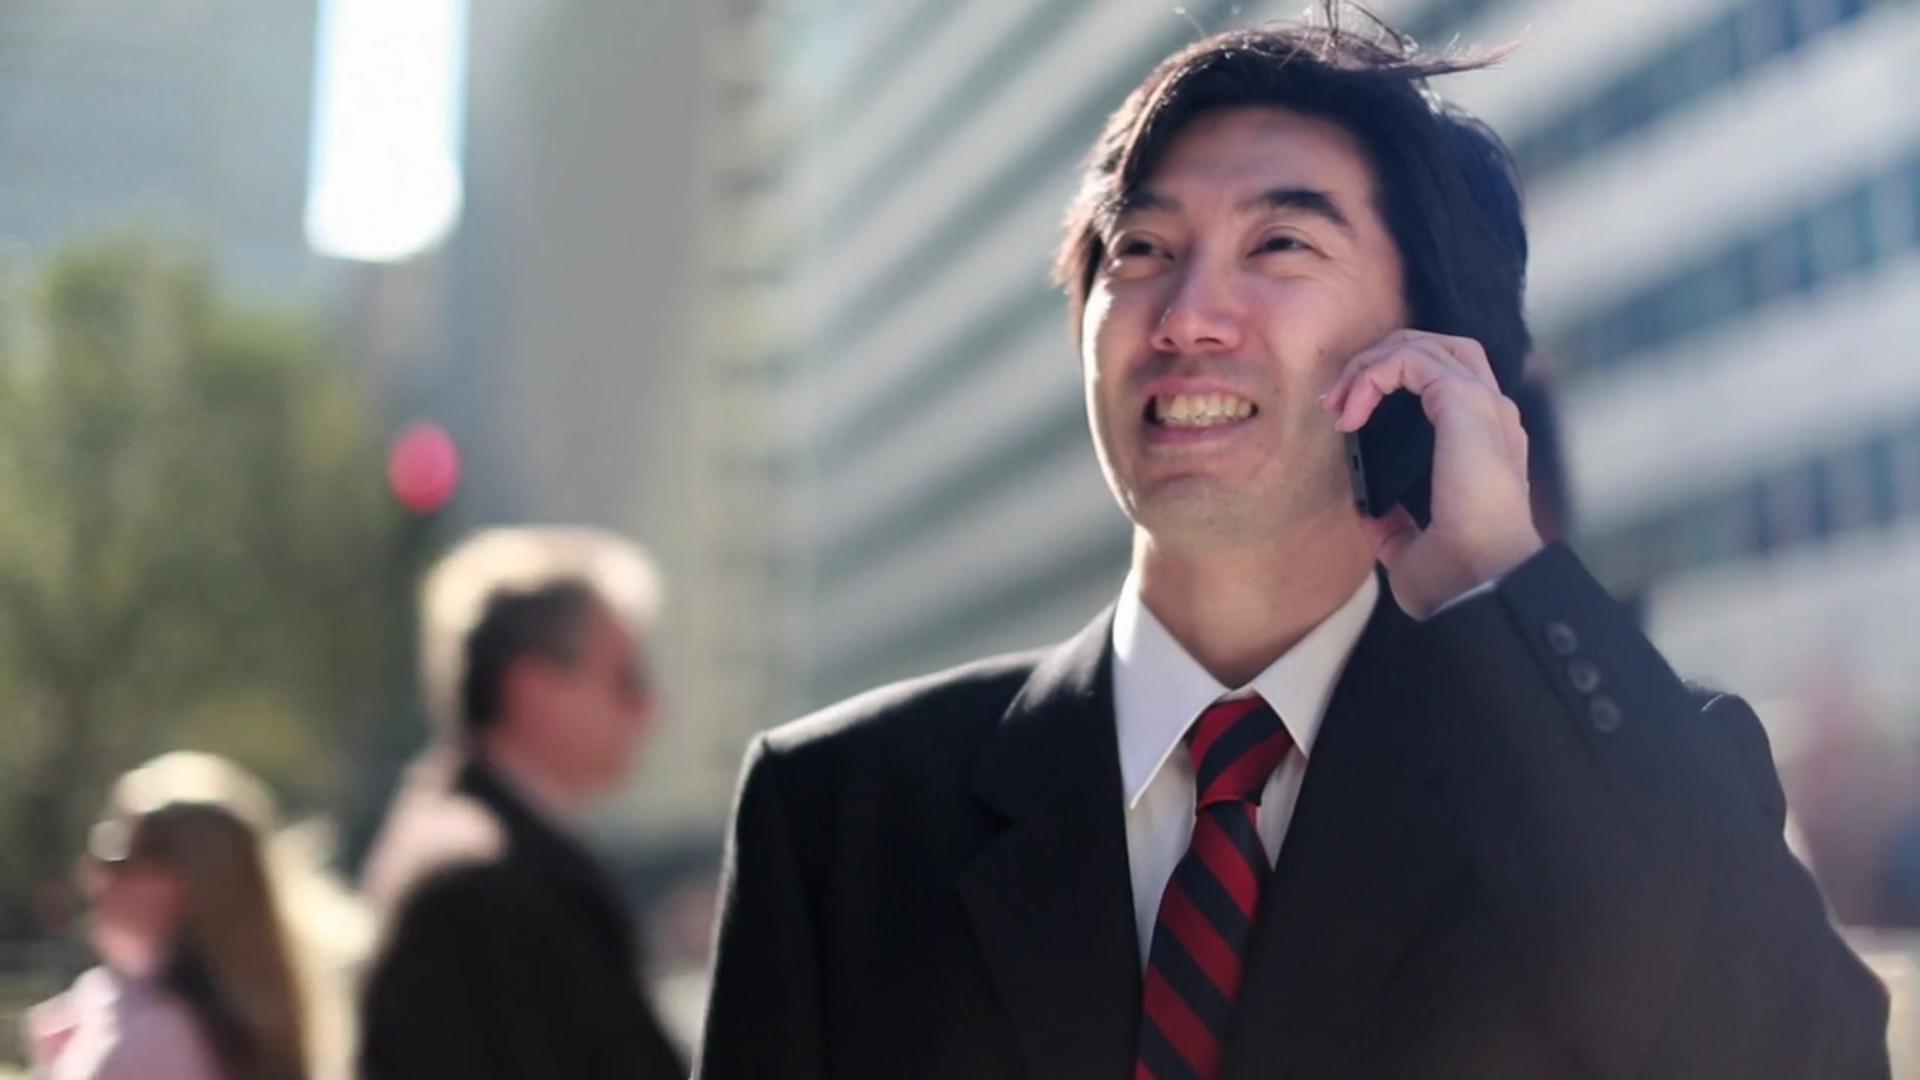 KKR 的投资方法:亚太地区私募股权